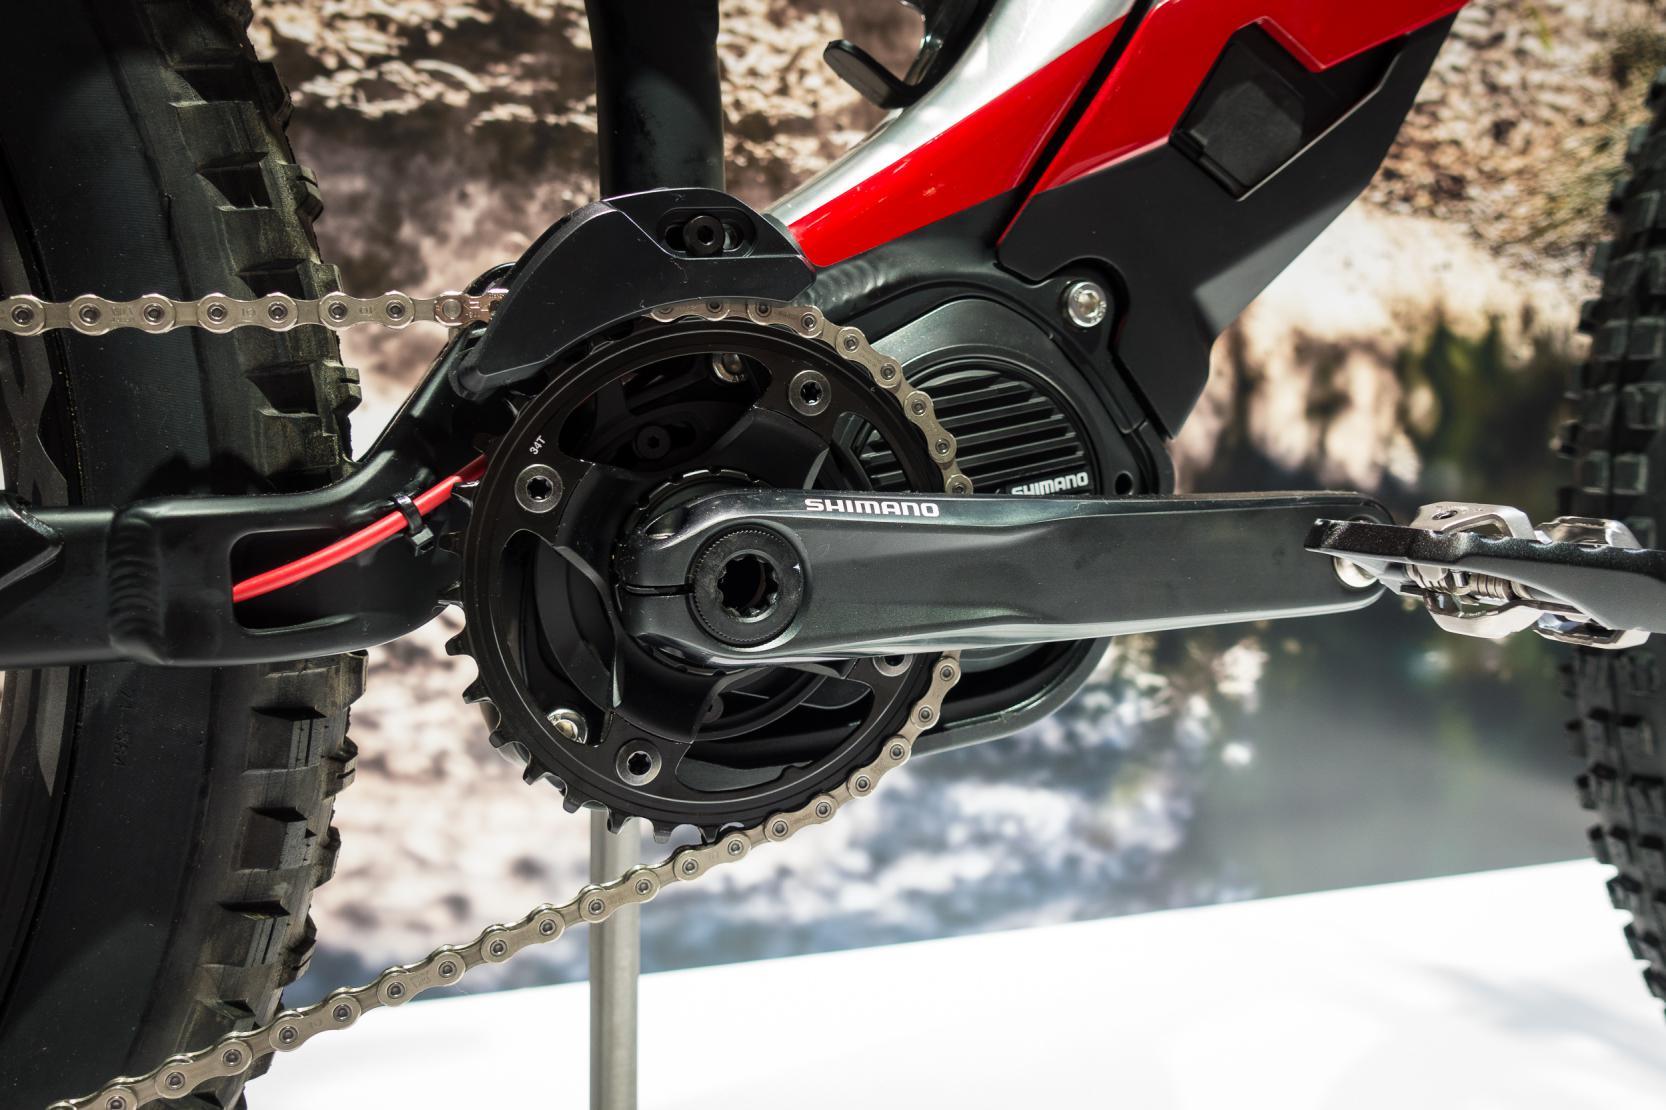 #2 Shimano Steps E8000 Motor (250 Watt bei einem Drehmoment von 70 Nm) inkl. 504 Wh Batterie